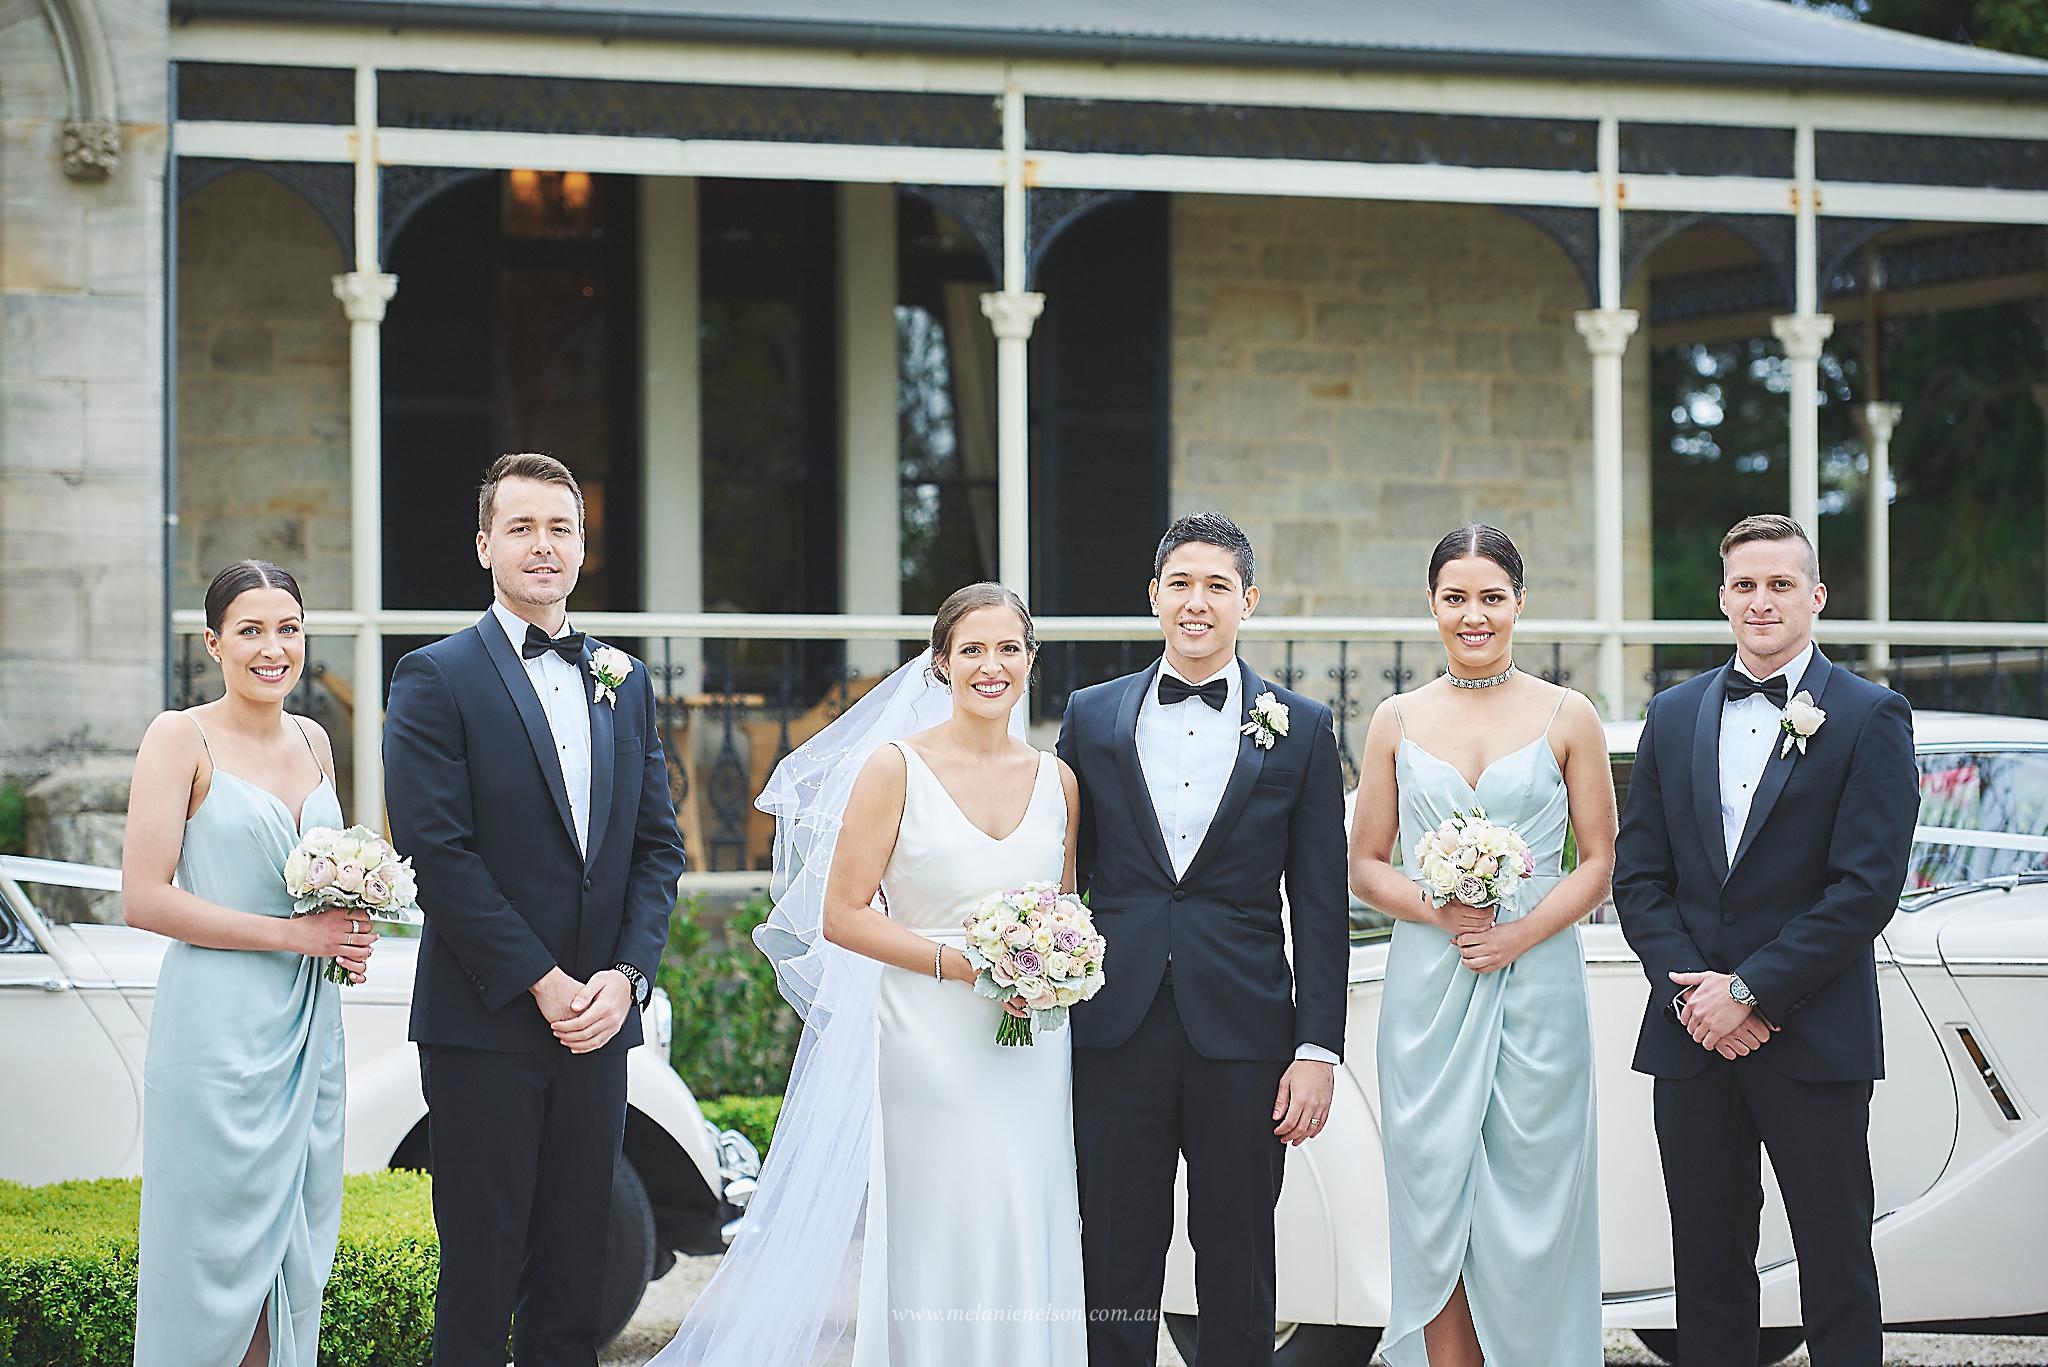 mount_lofty_wedding_0053.jpg